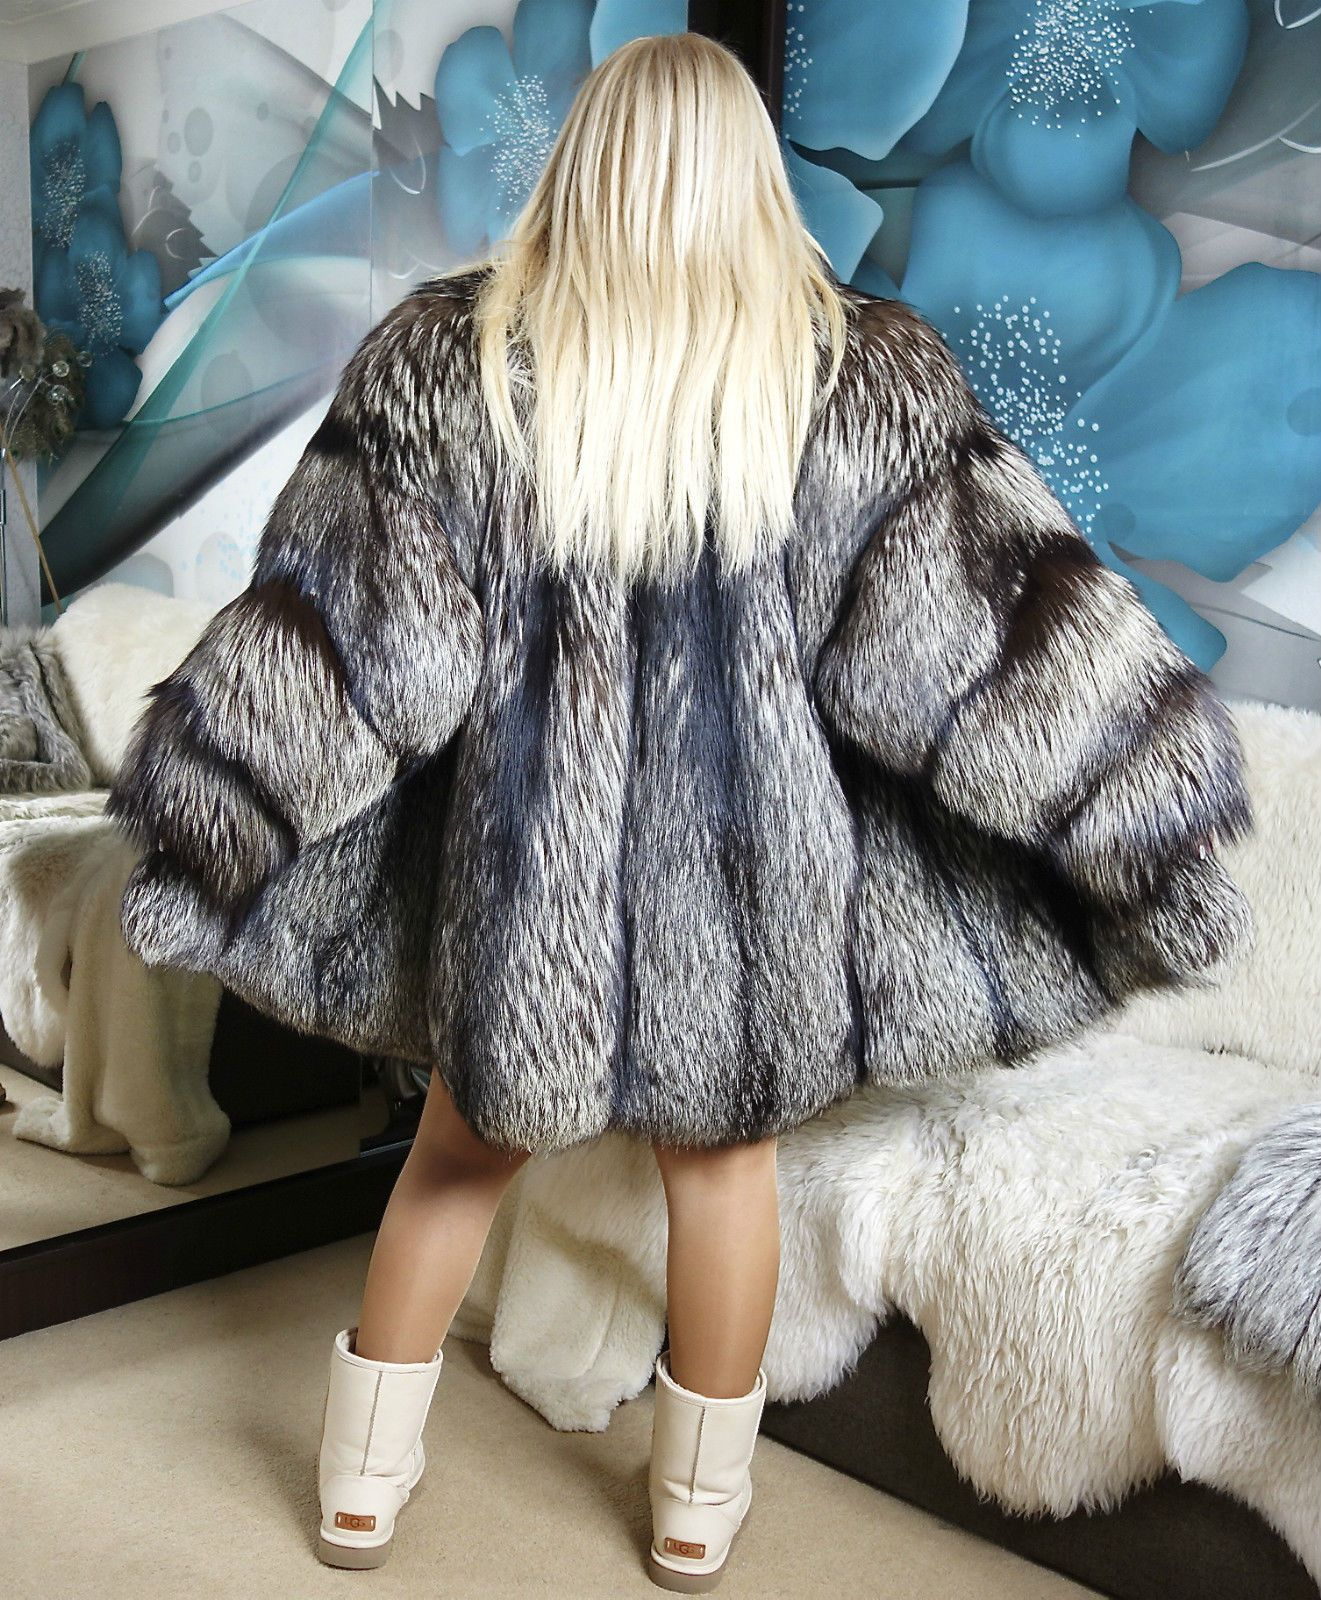 Amazing Silver Saga Fox Fur Coat Jacket Size M L Unisex Look Fox Fur Coat Fur Coat Unisex Looks [ 1600 x 1321 Pixel ]